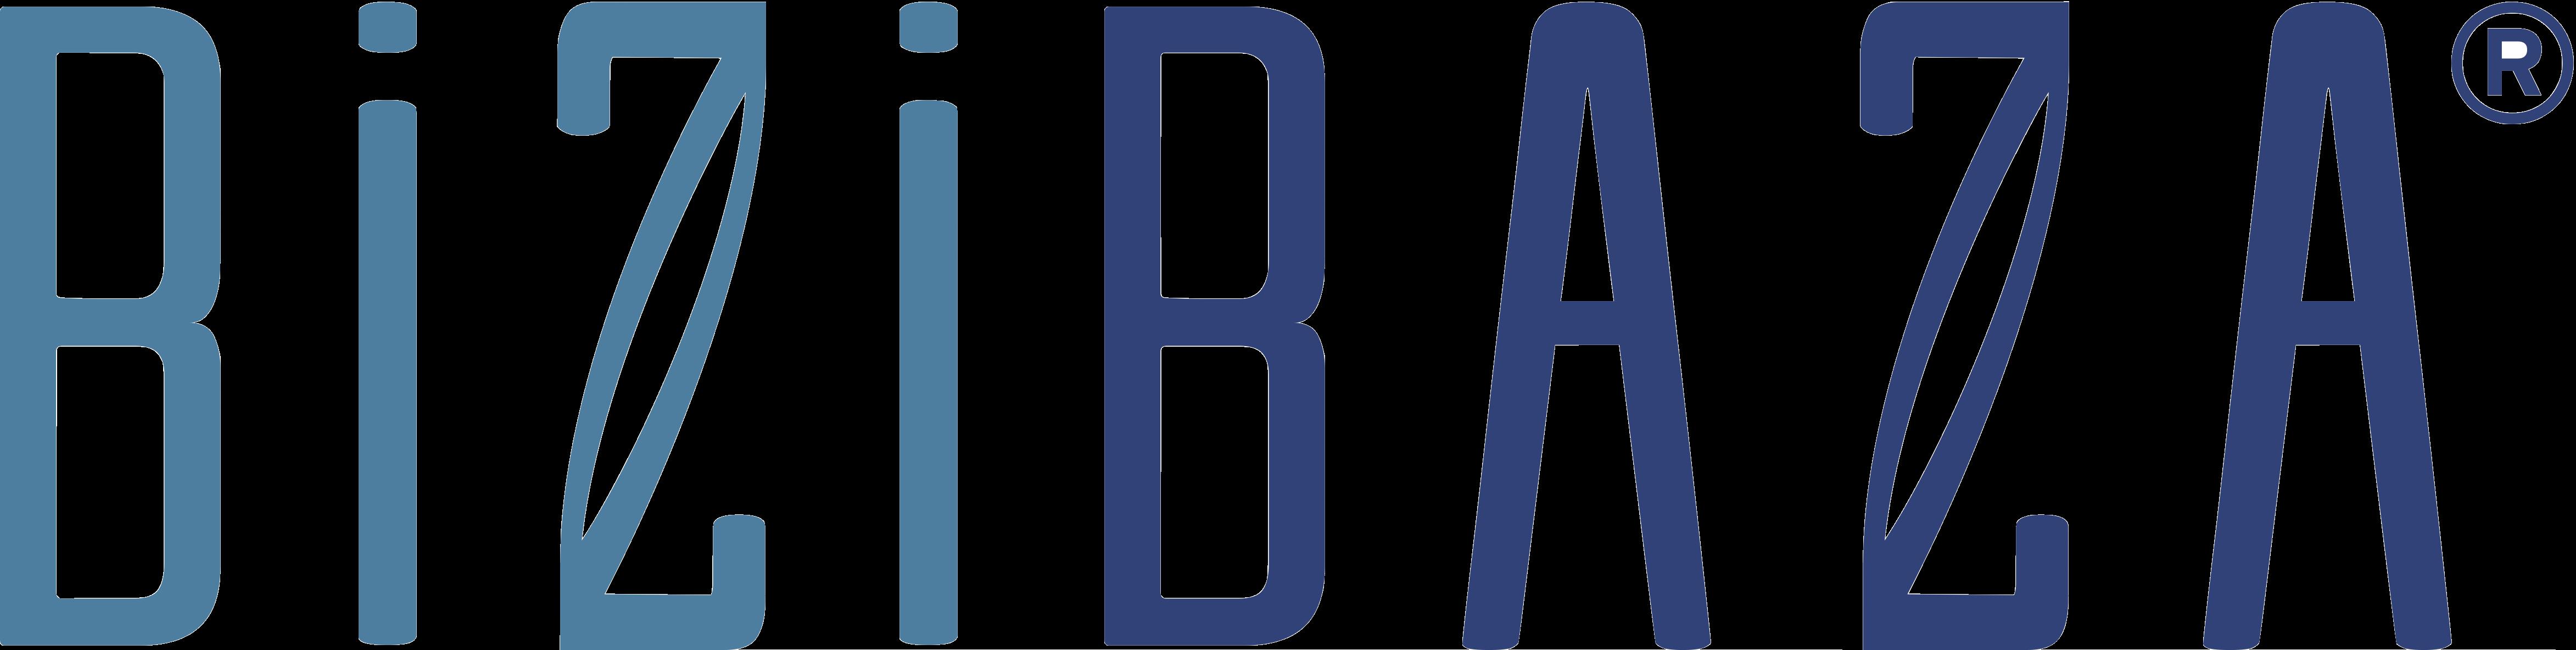 bizibaza-logo